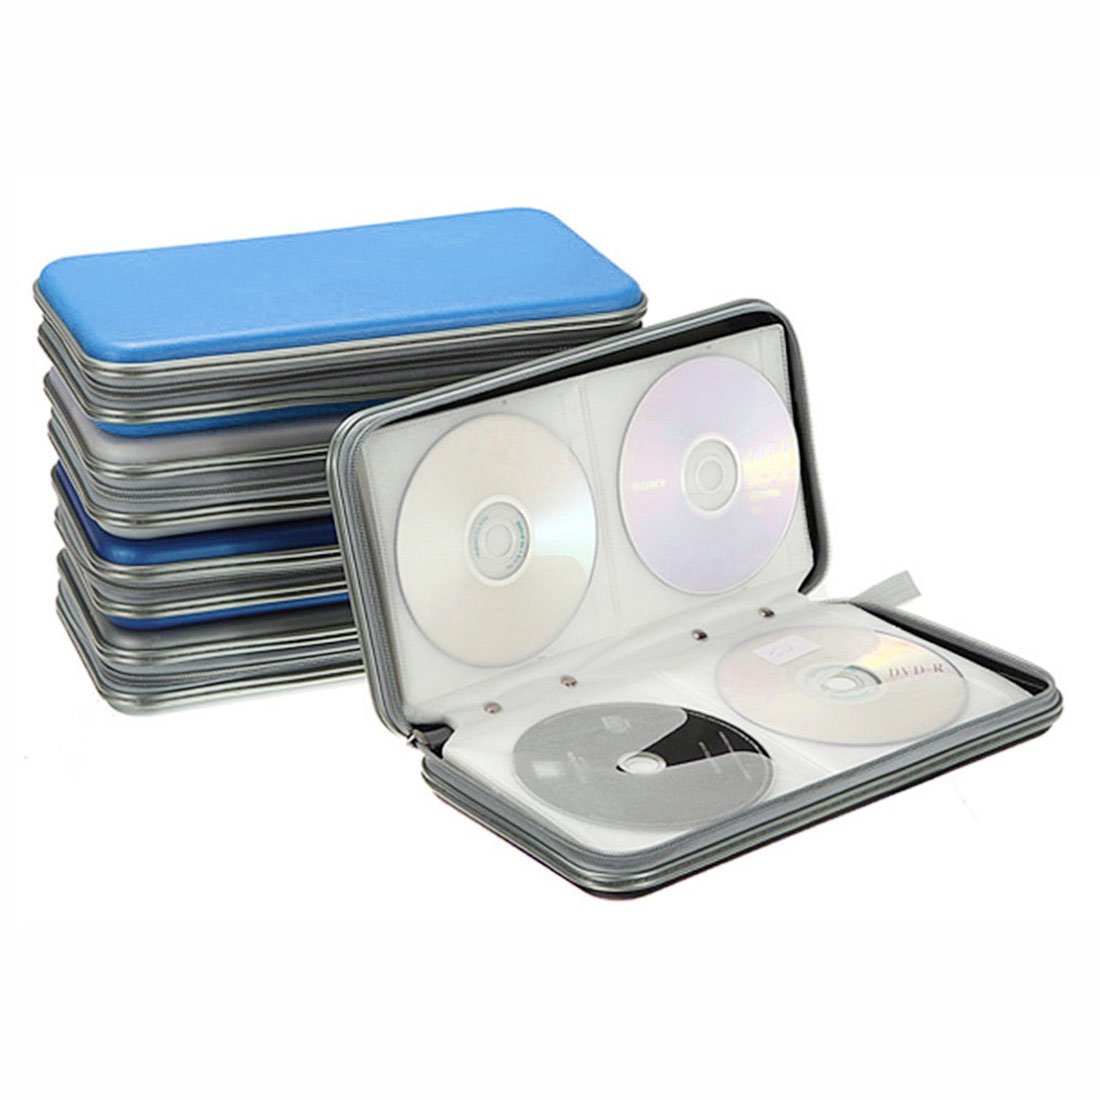 Black-40p Portable Plastic Disc CD//DVD Wallets Storage Organizer Bags